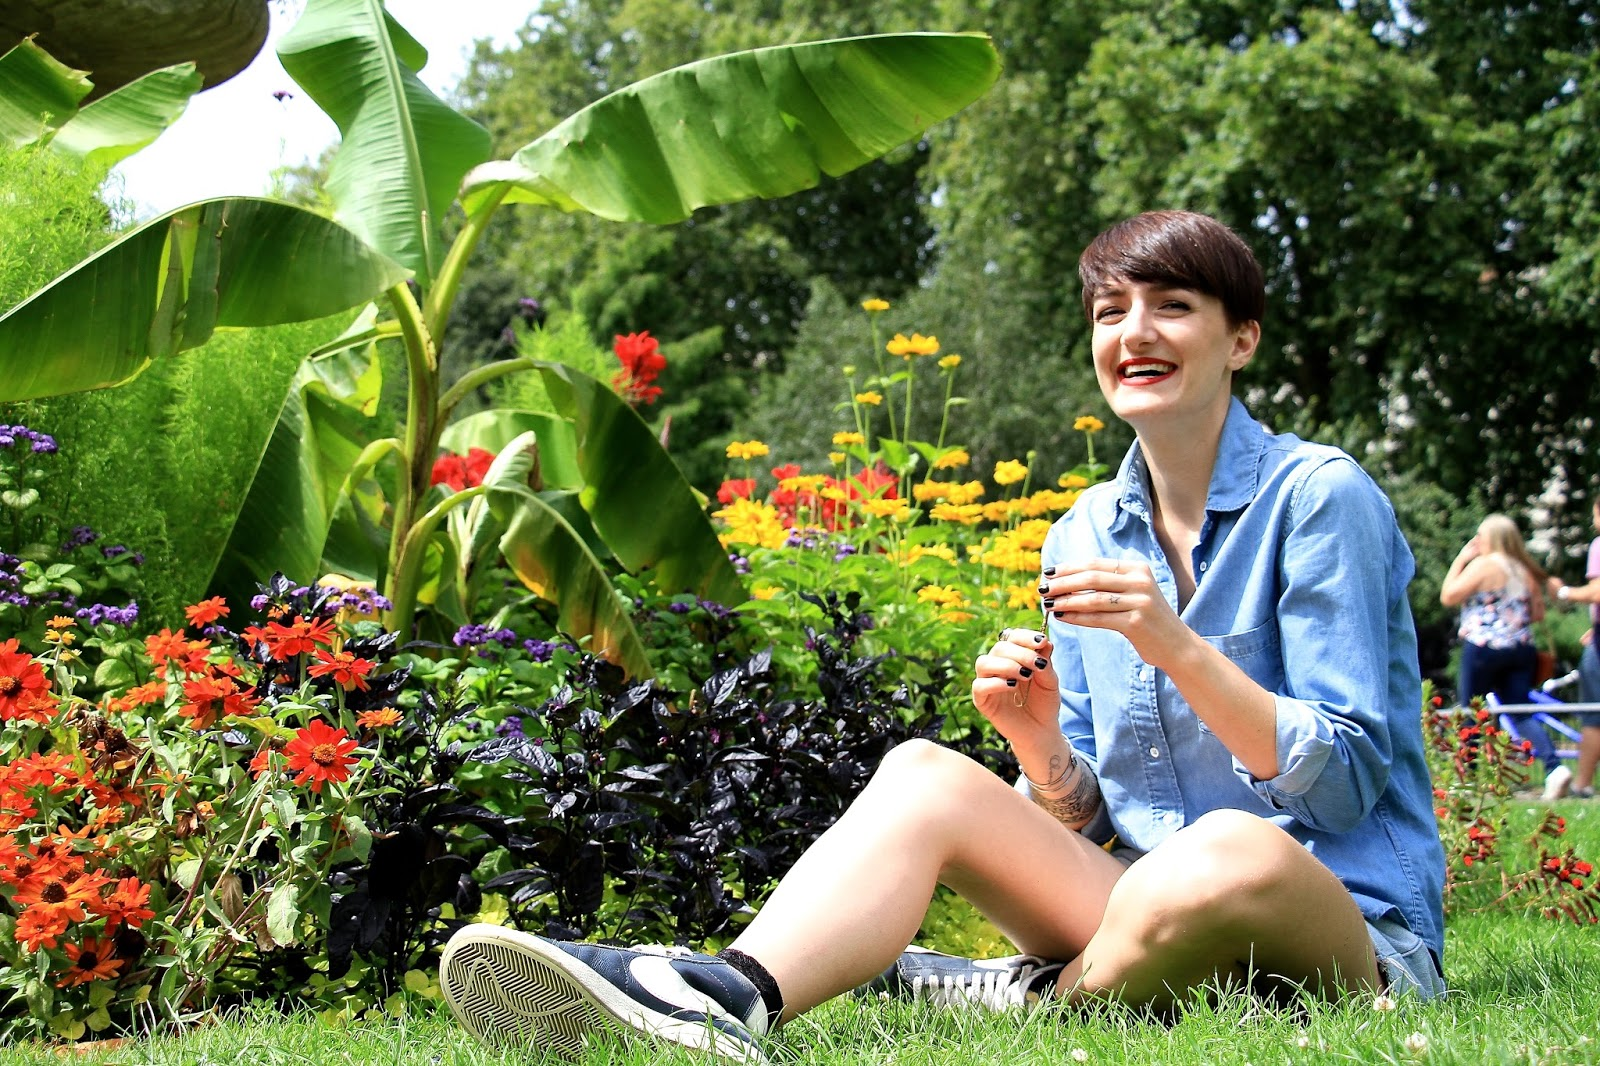 no flowers hyde park gardens london photography Nars Dragon Girl lipstick lexie blush www.lexieblush.co.uk